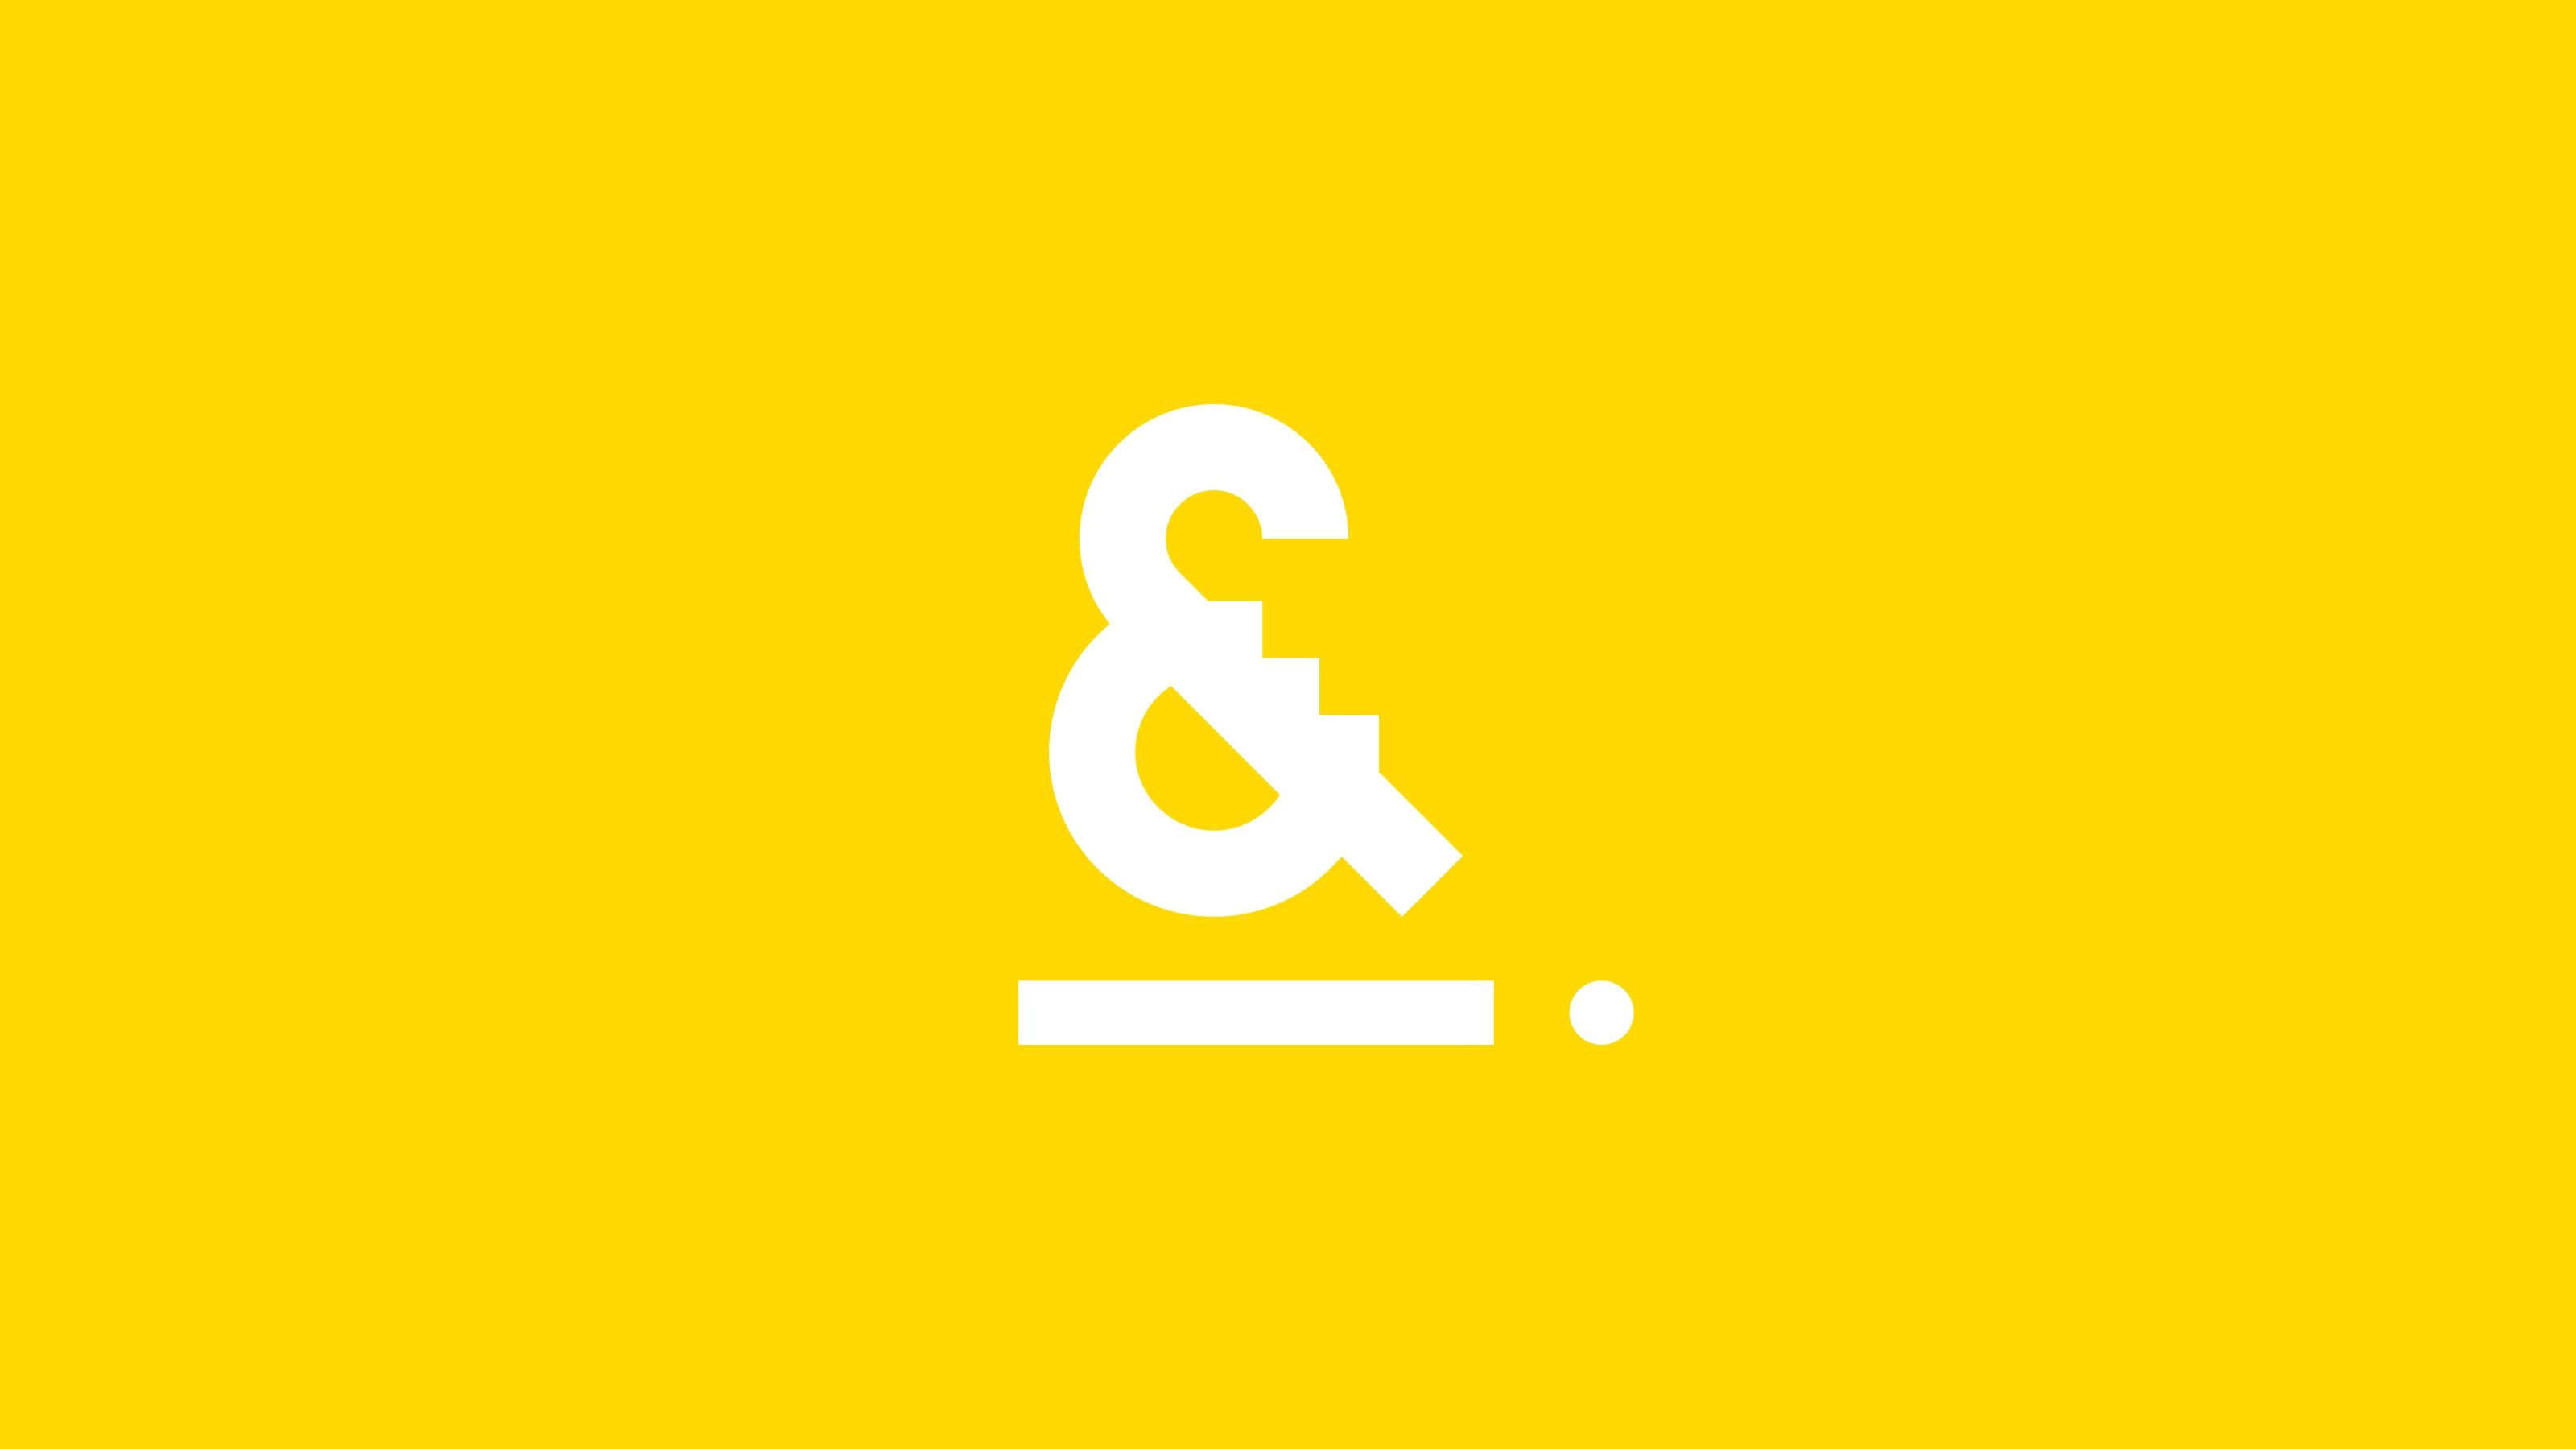 Burgess&Co. brand identity logo ampersand.